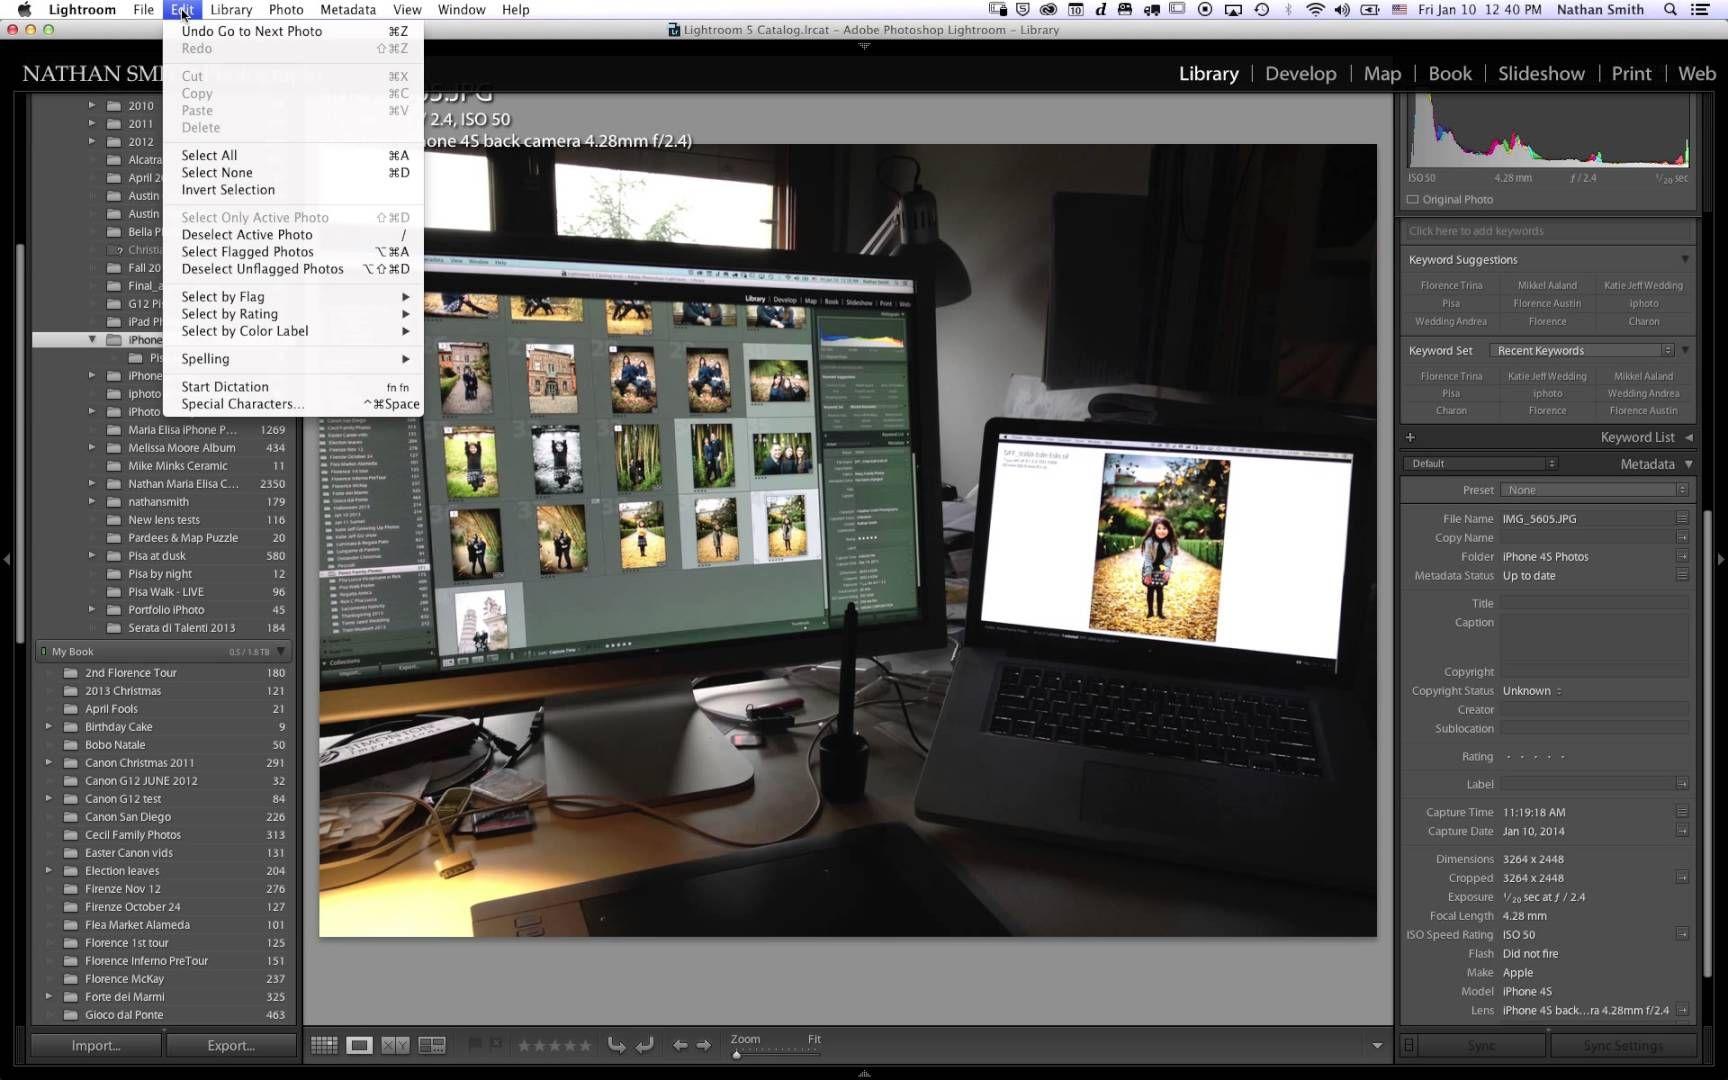 Wacom Intuos Pro Setup - LR 5 & Photoshop - SEE BELOW